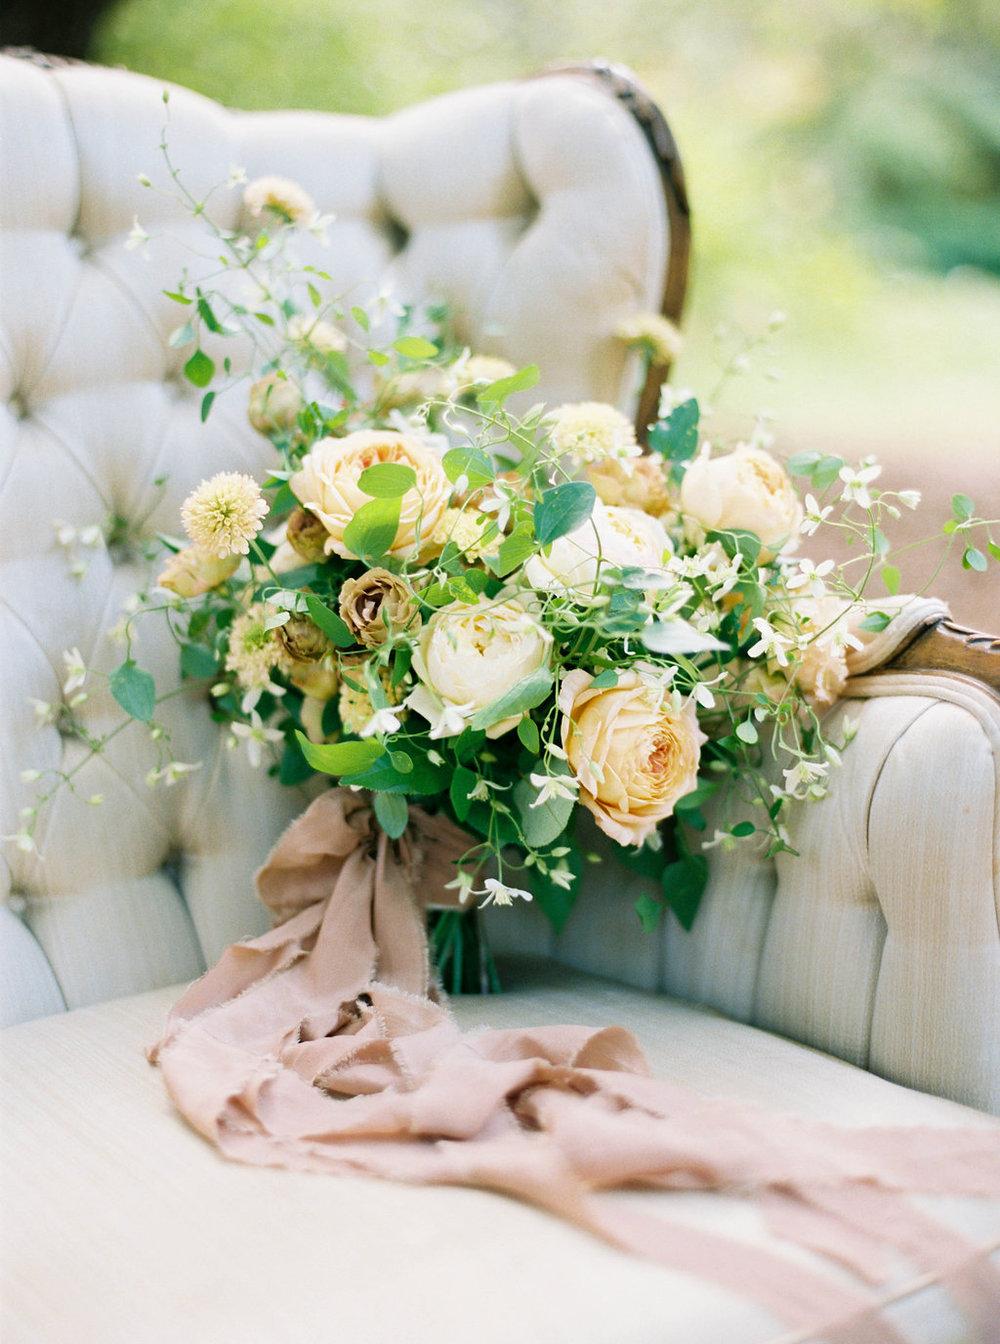 Sarah Carpenter Photography  | Floral:  Wild Bloom Floral